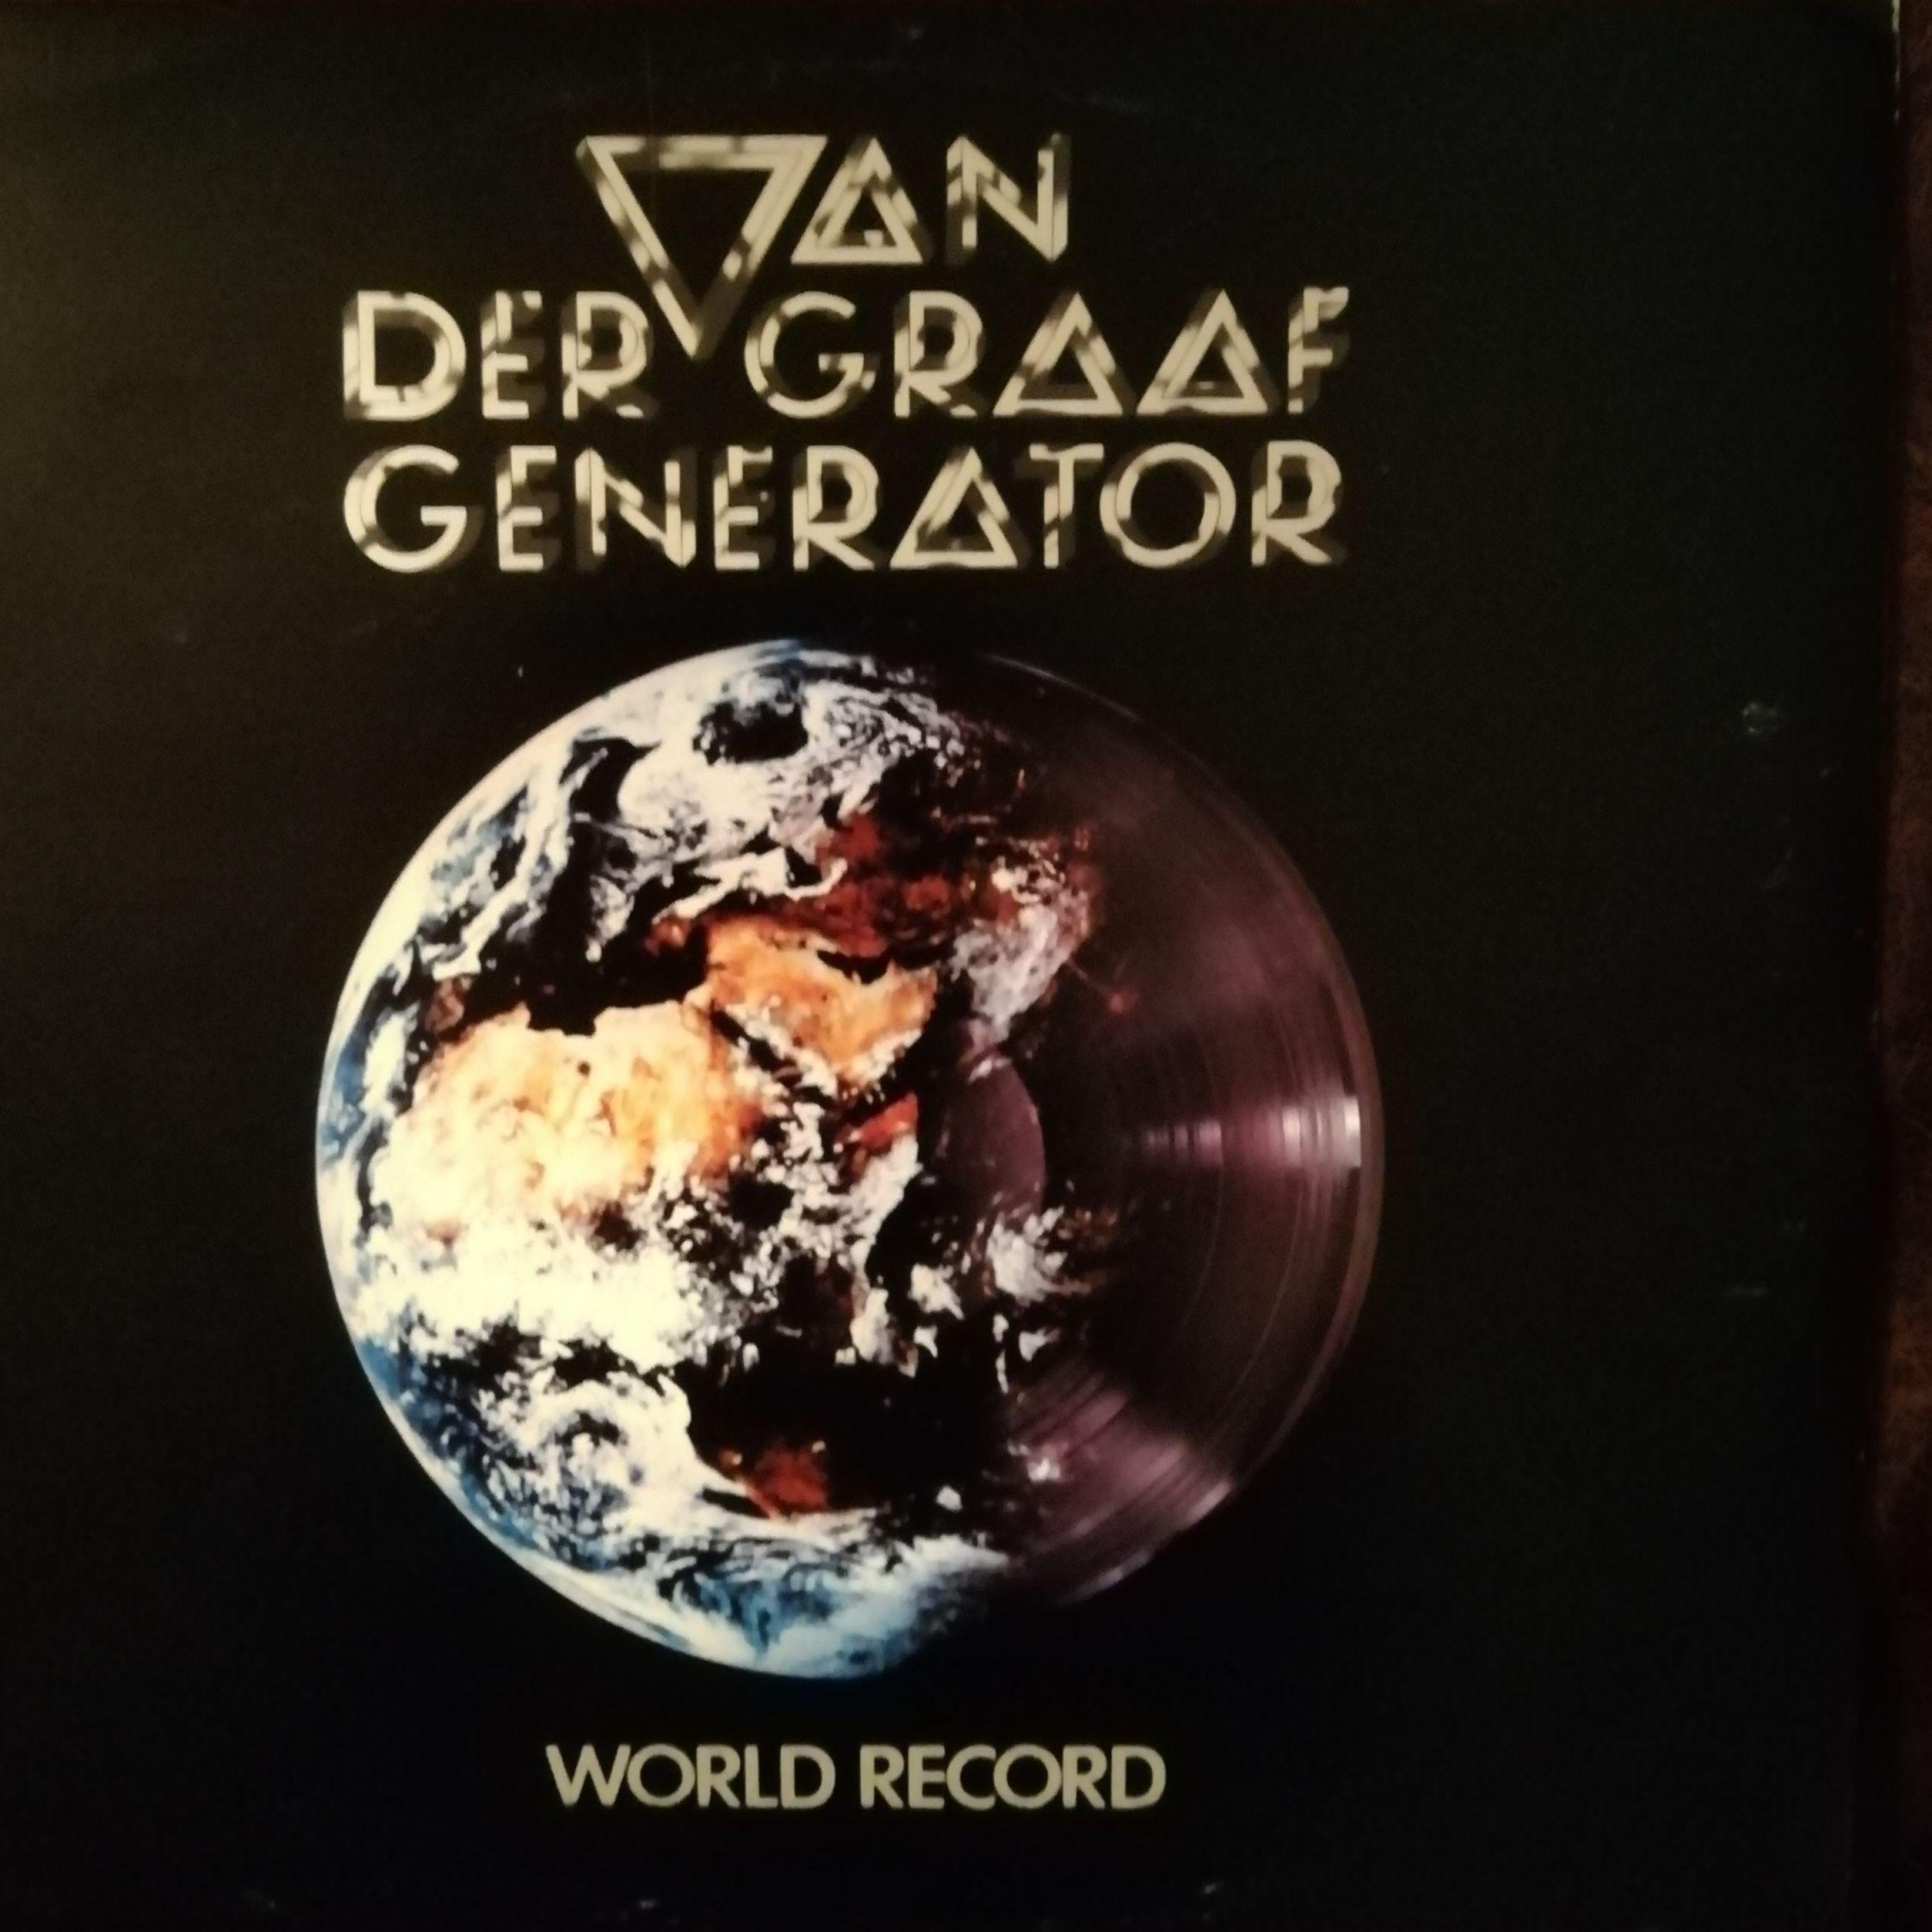 Van Der Graaf Generator World Record LP undefined